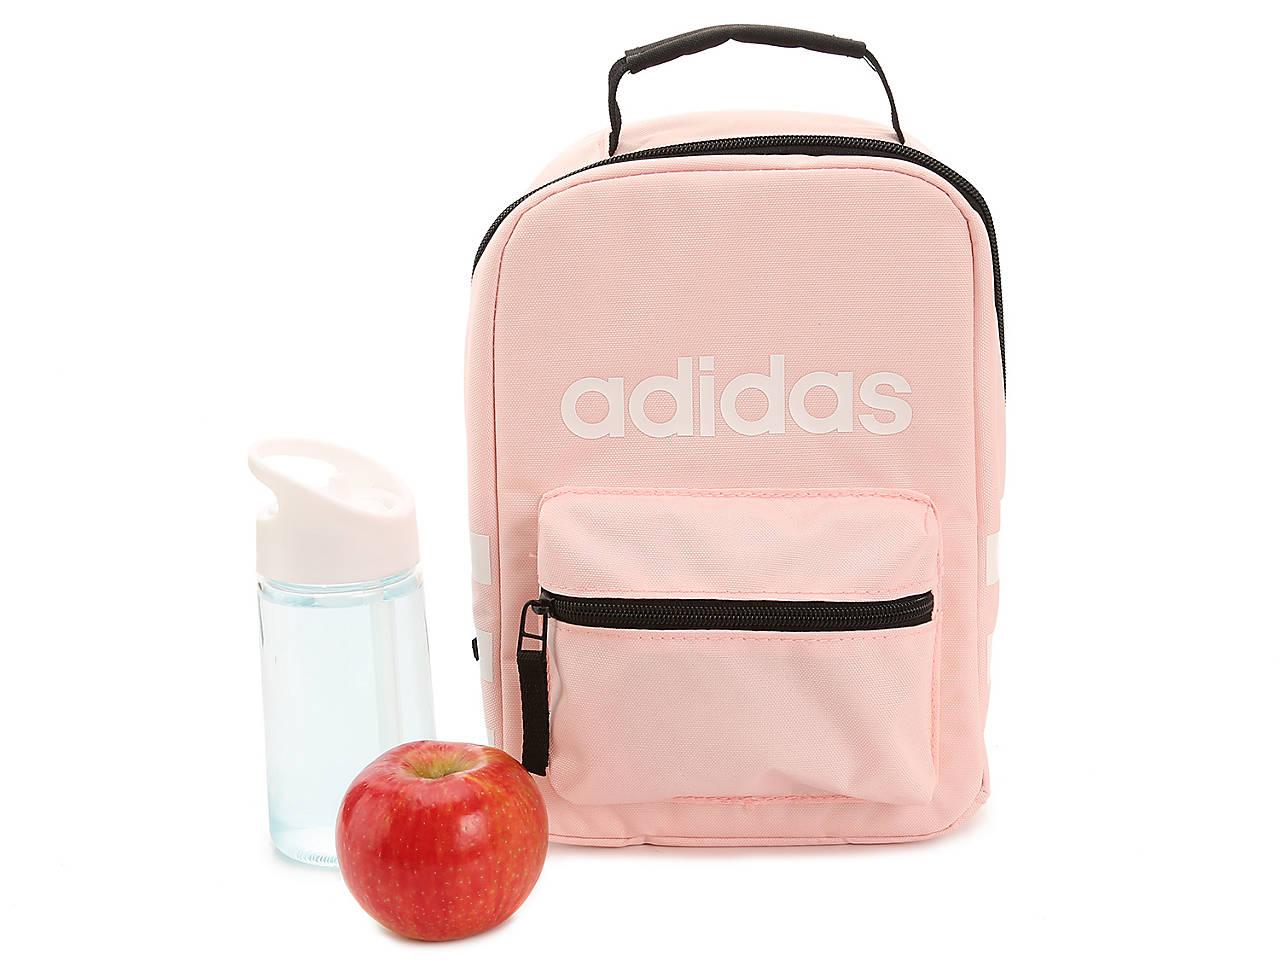 1f4158676db7 adidas Santiago Lunch Box Women s Handbags   Accessories